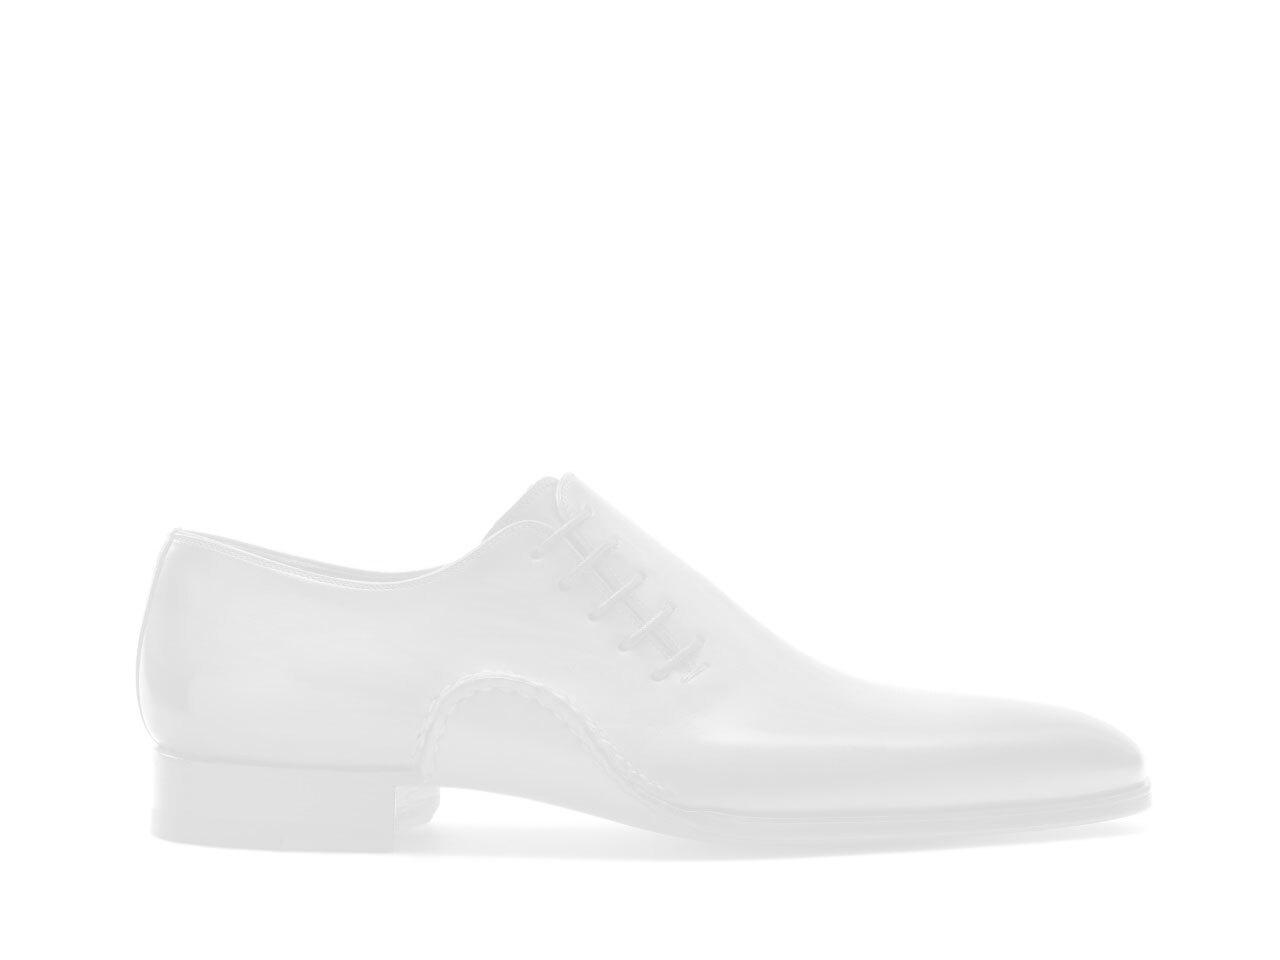 Sole of the Magnanni Isaac Cognac Men's Double Monk Strap Shoes